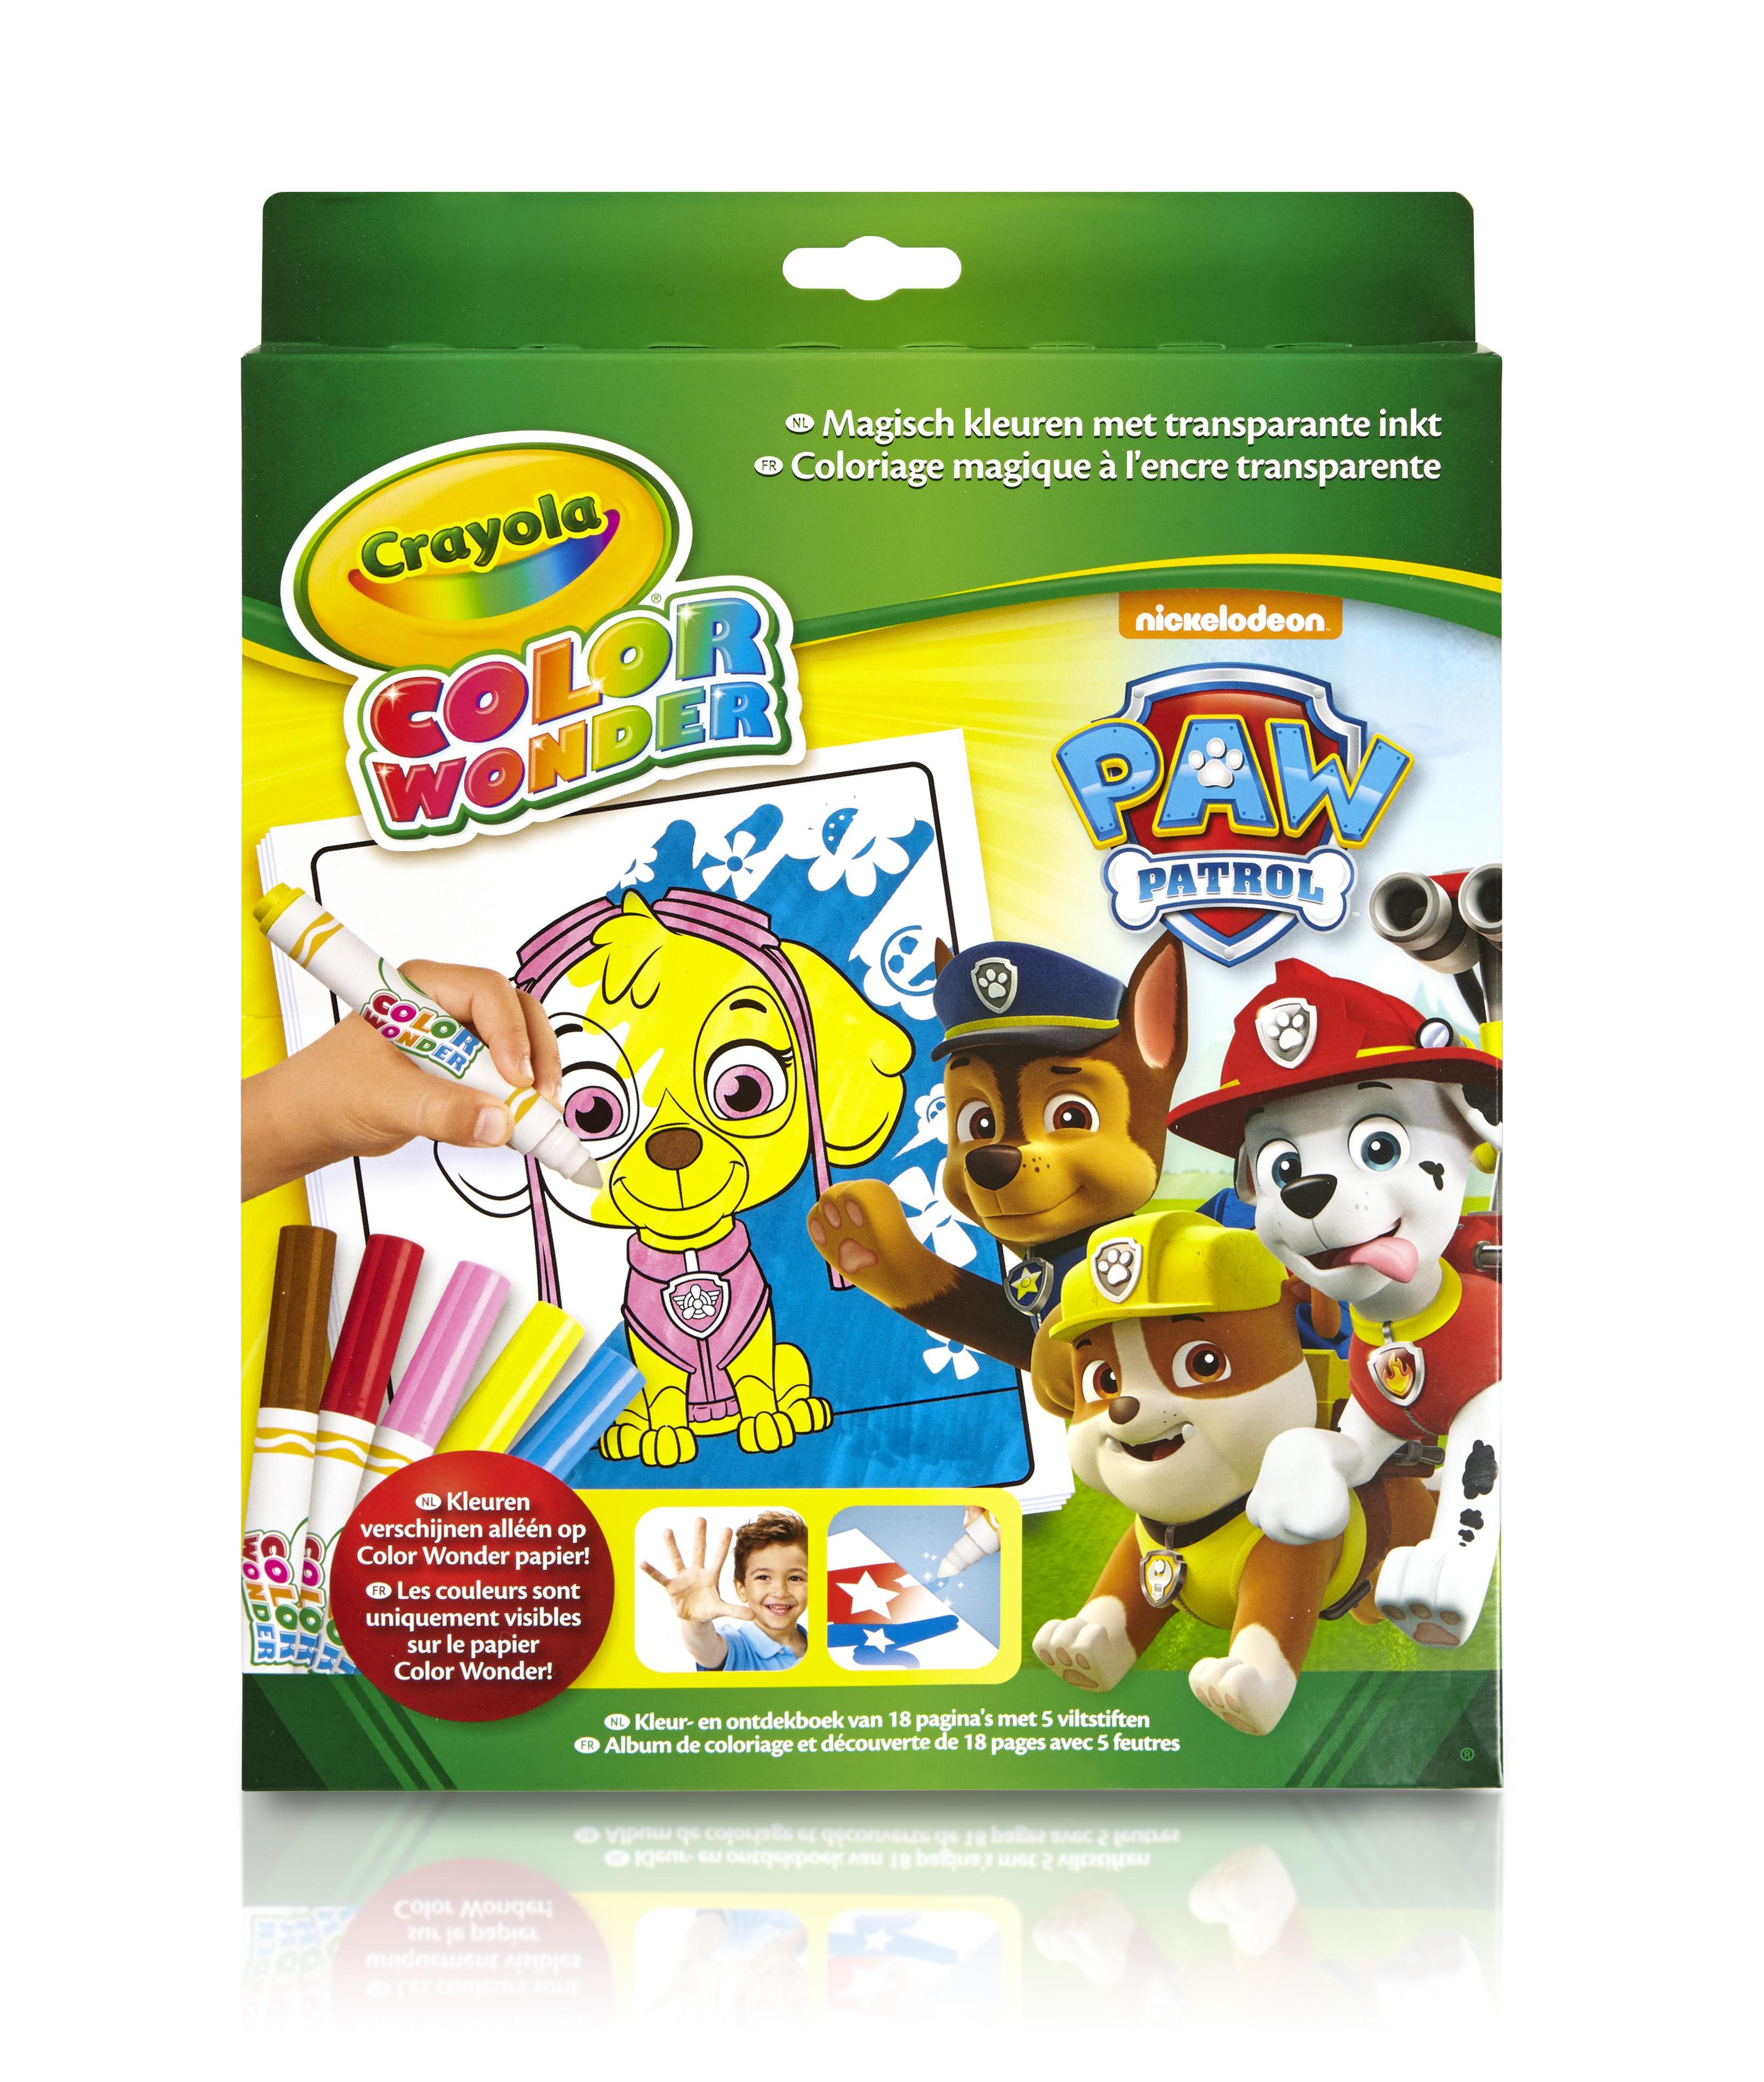 Crayola Color Wonder - Box Paw Patrol (CC070013) thumbnail